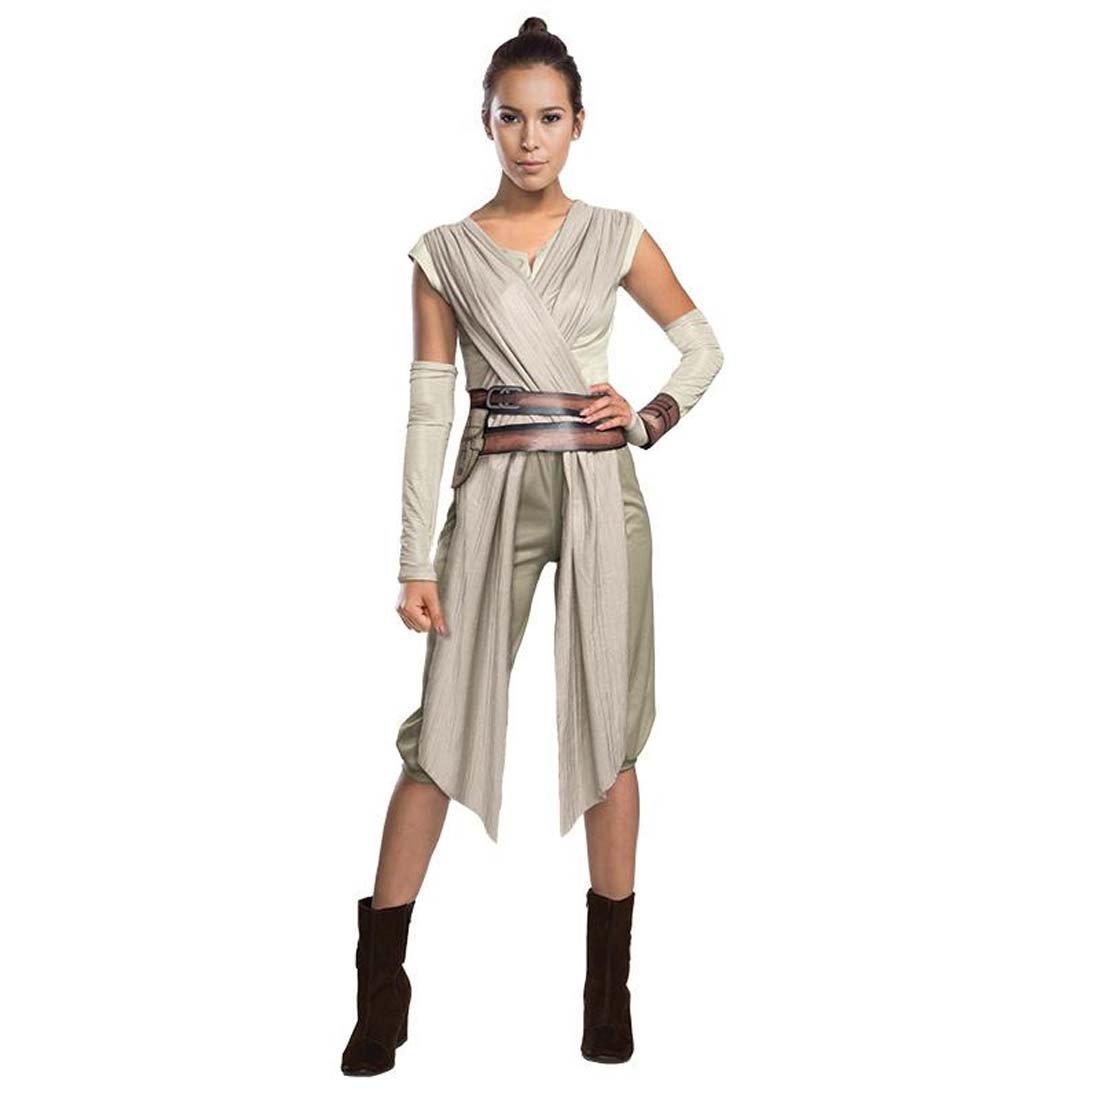 Disfraz mujer Rey Vestimenta Star Wars L 44/46 Atuendo ...